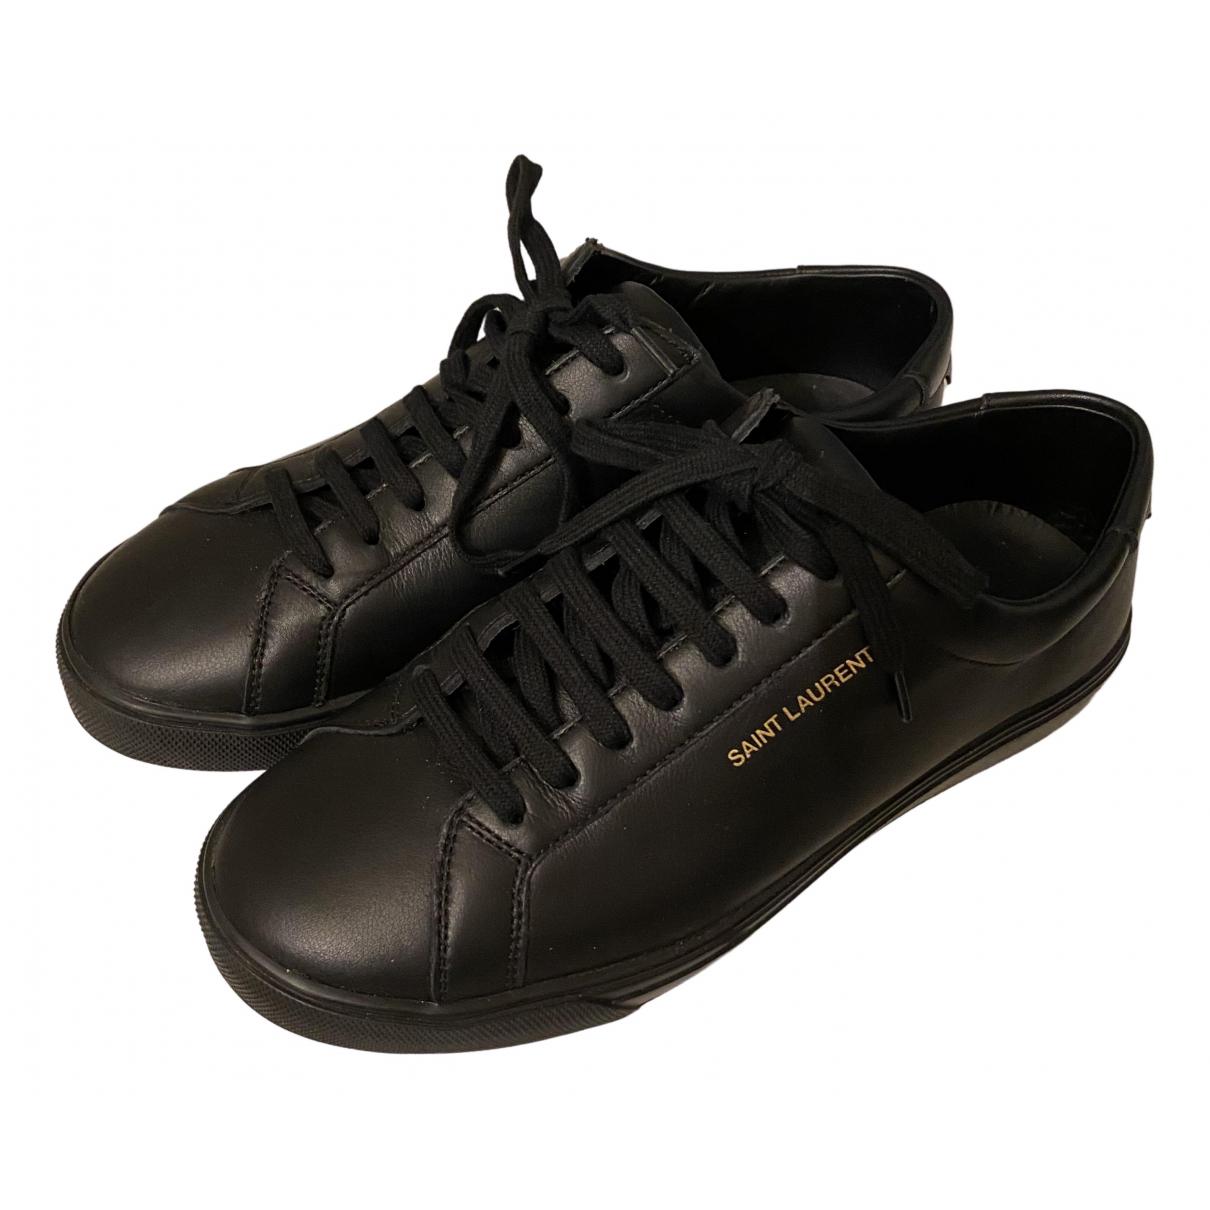 Saint Laurent Andy Black Leather Trainers for Women 38 EU